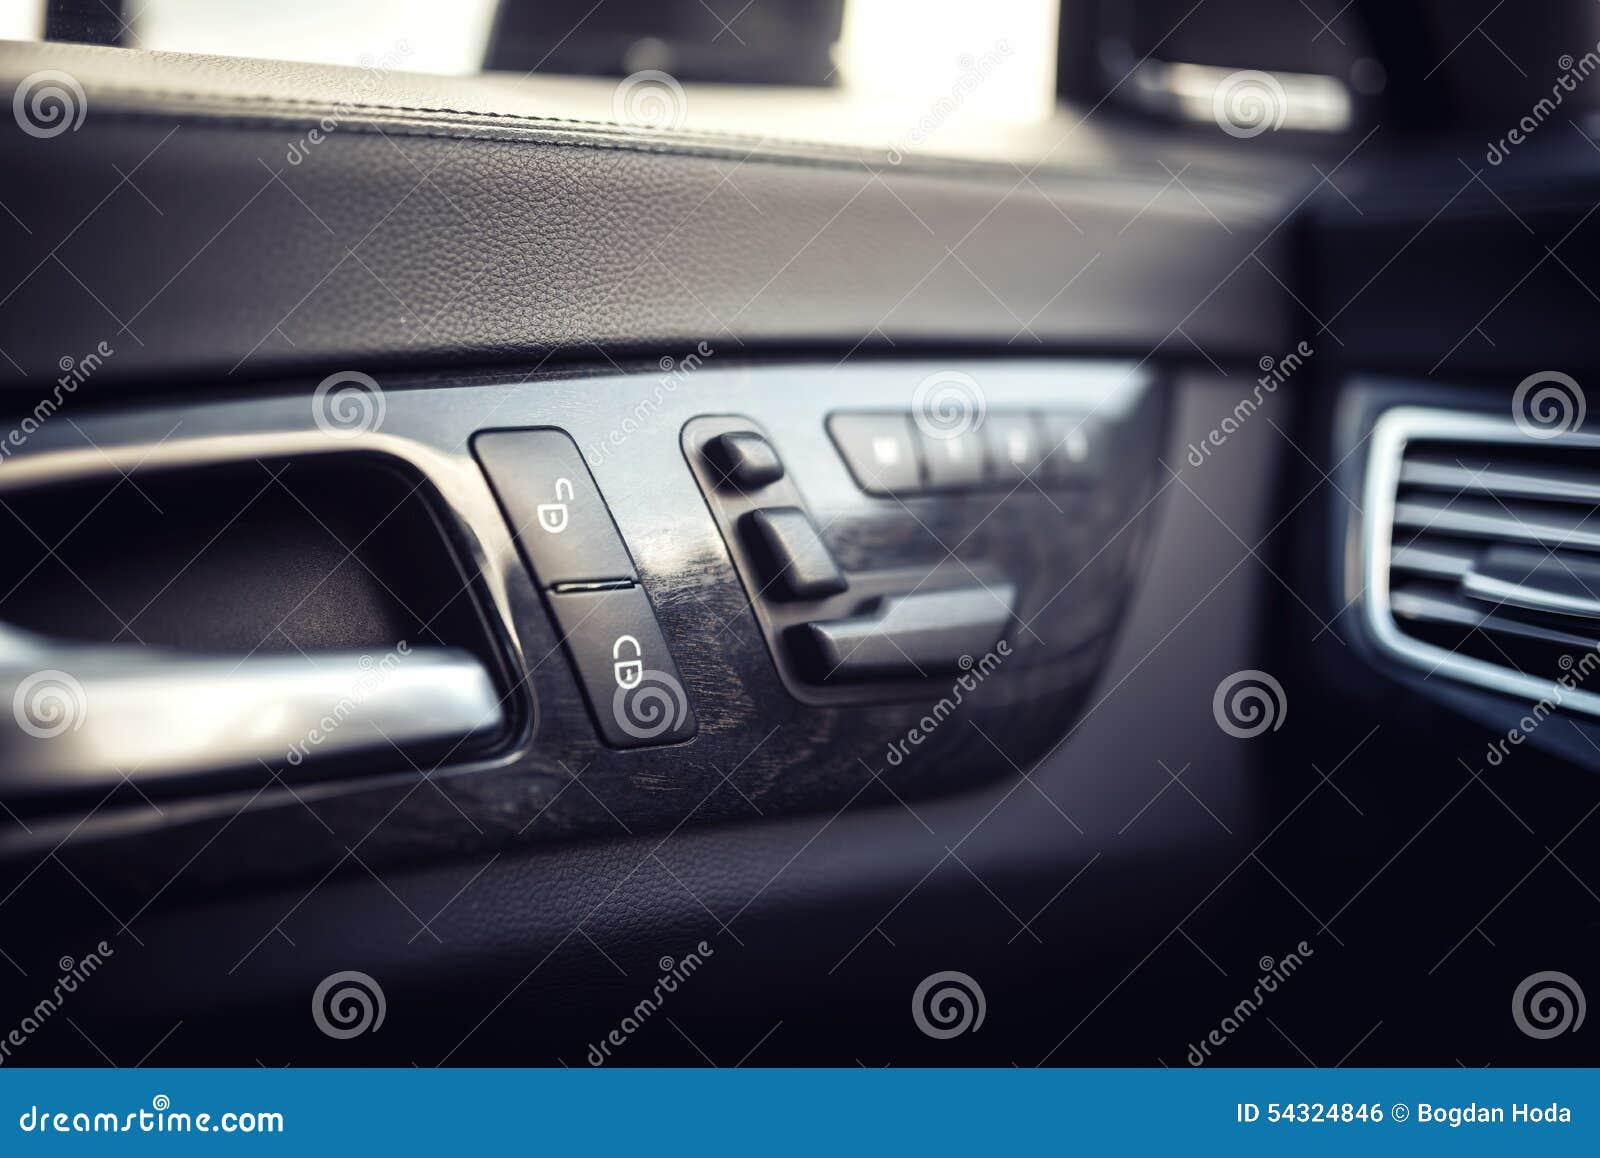 car leather interior details of door handle with windows controls seat adjustments modern. Black Bedroom Furniture Sets. Home Design Ideas